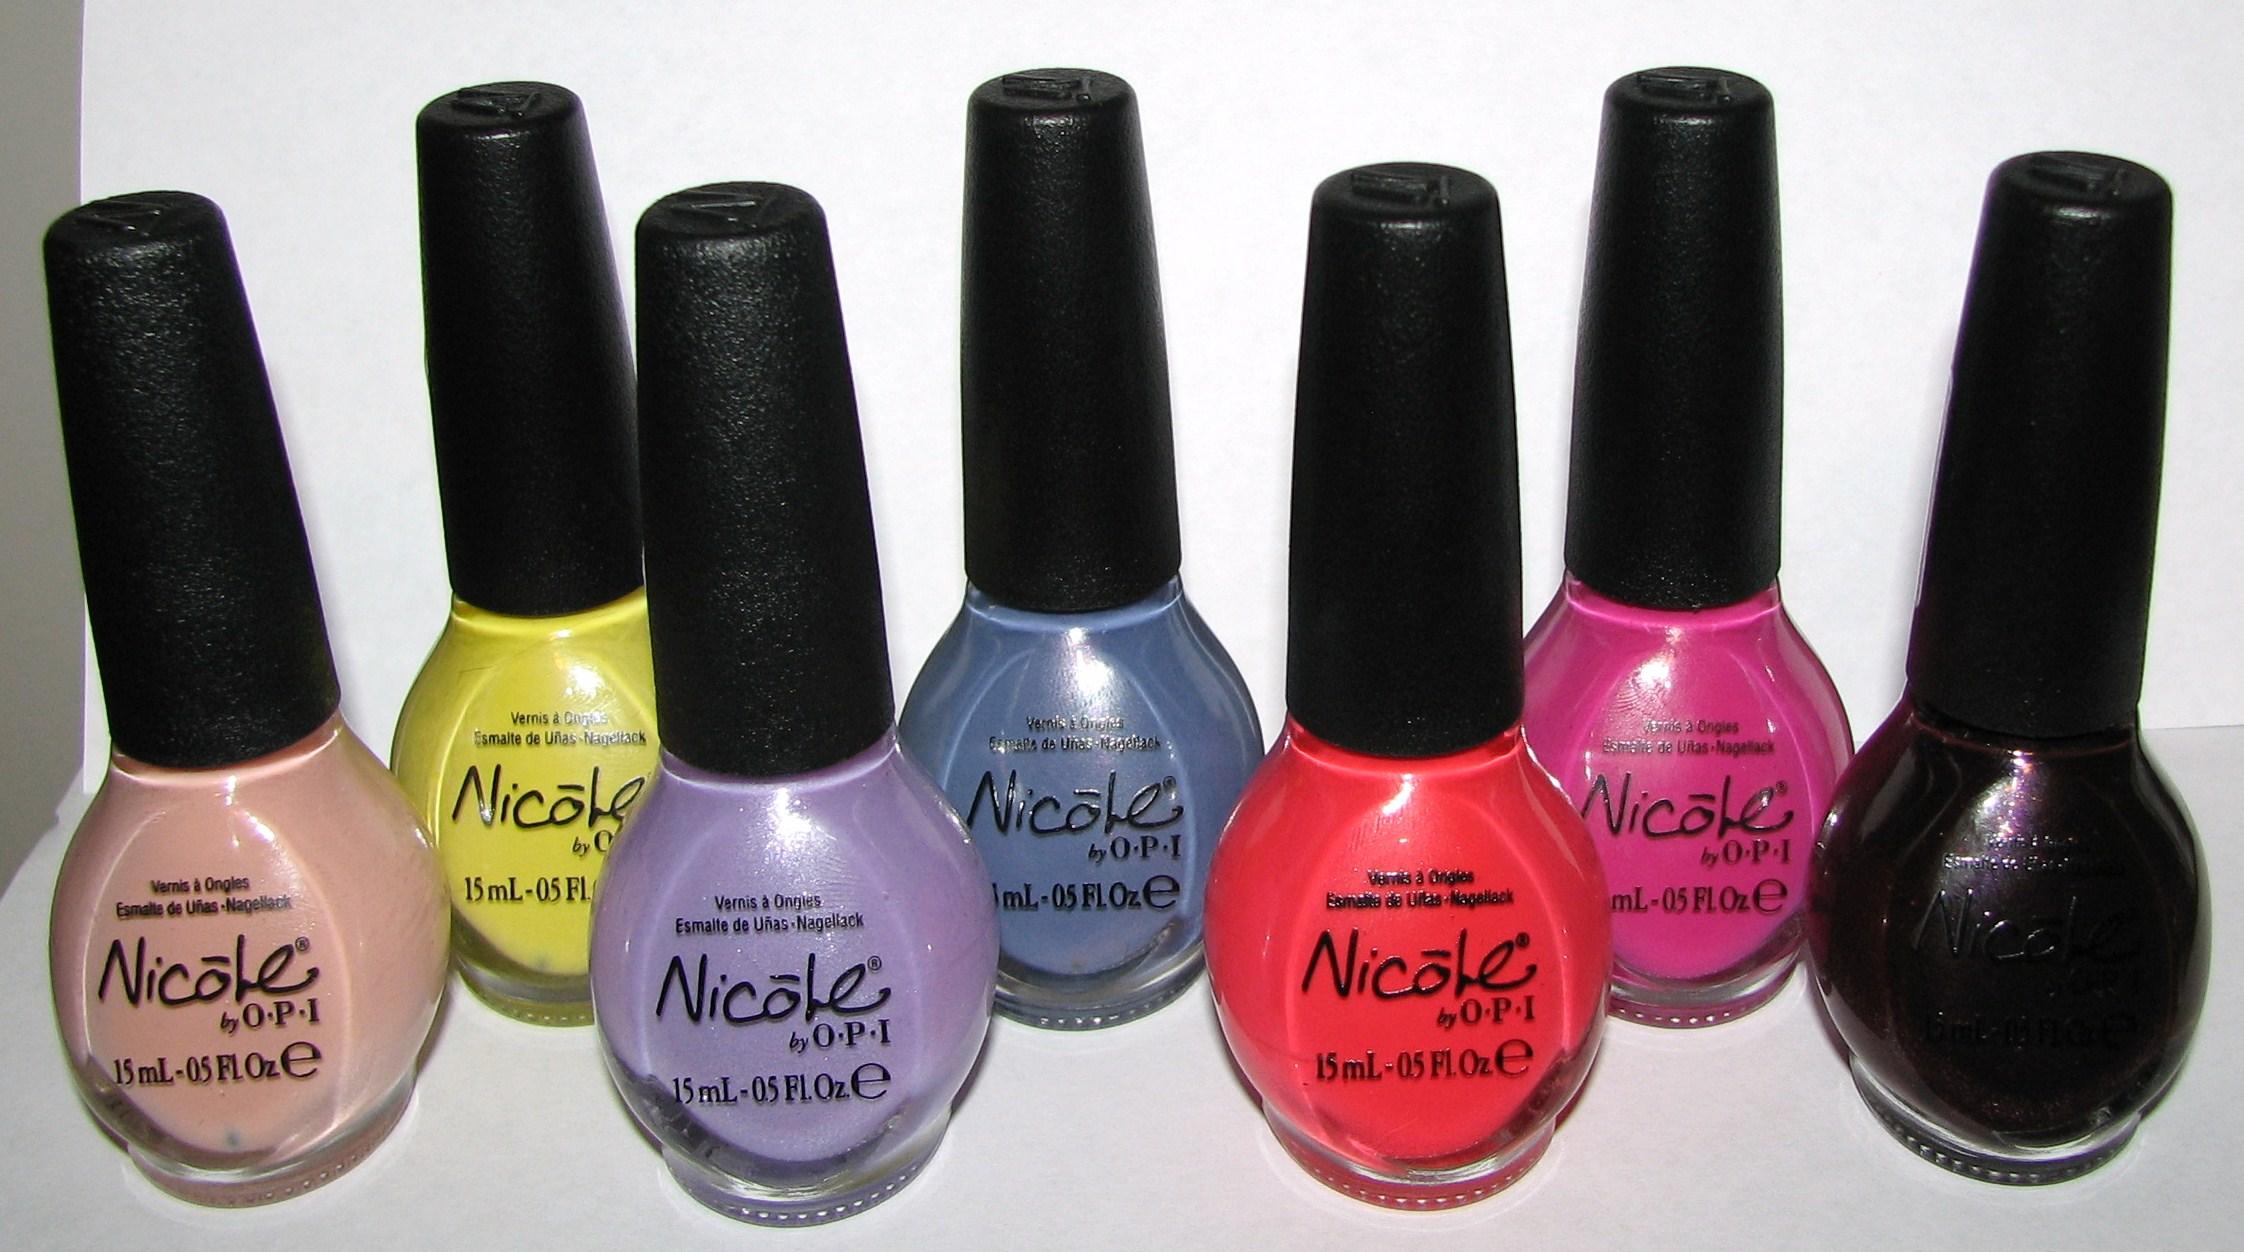 nicole by opi kardashian kolors nail polish - cvs exclusives spring 2012